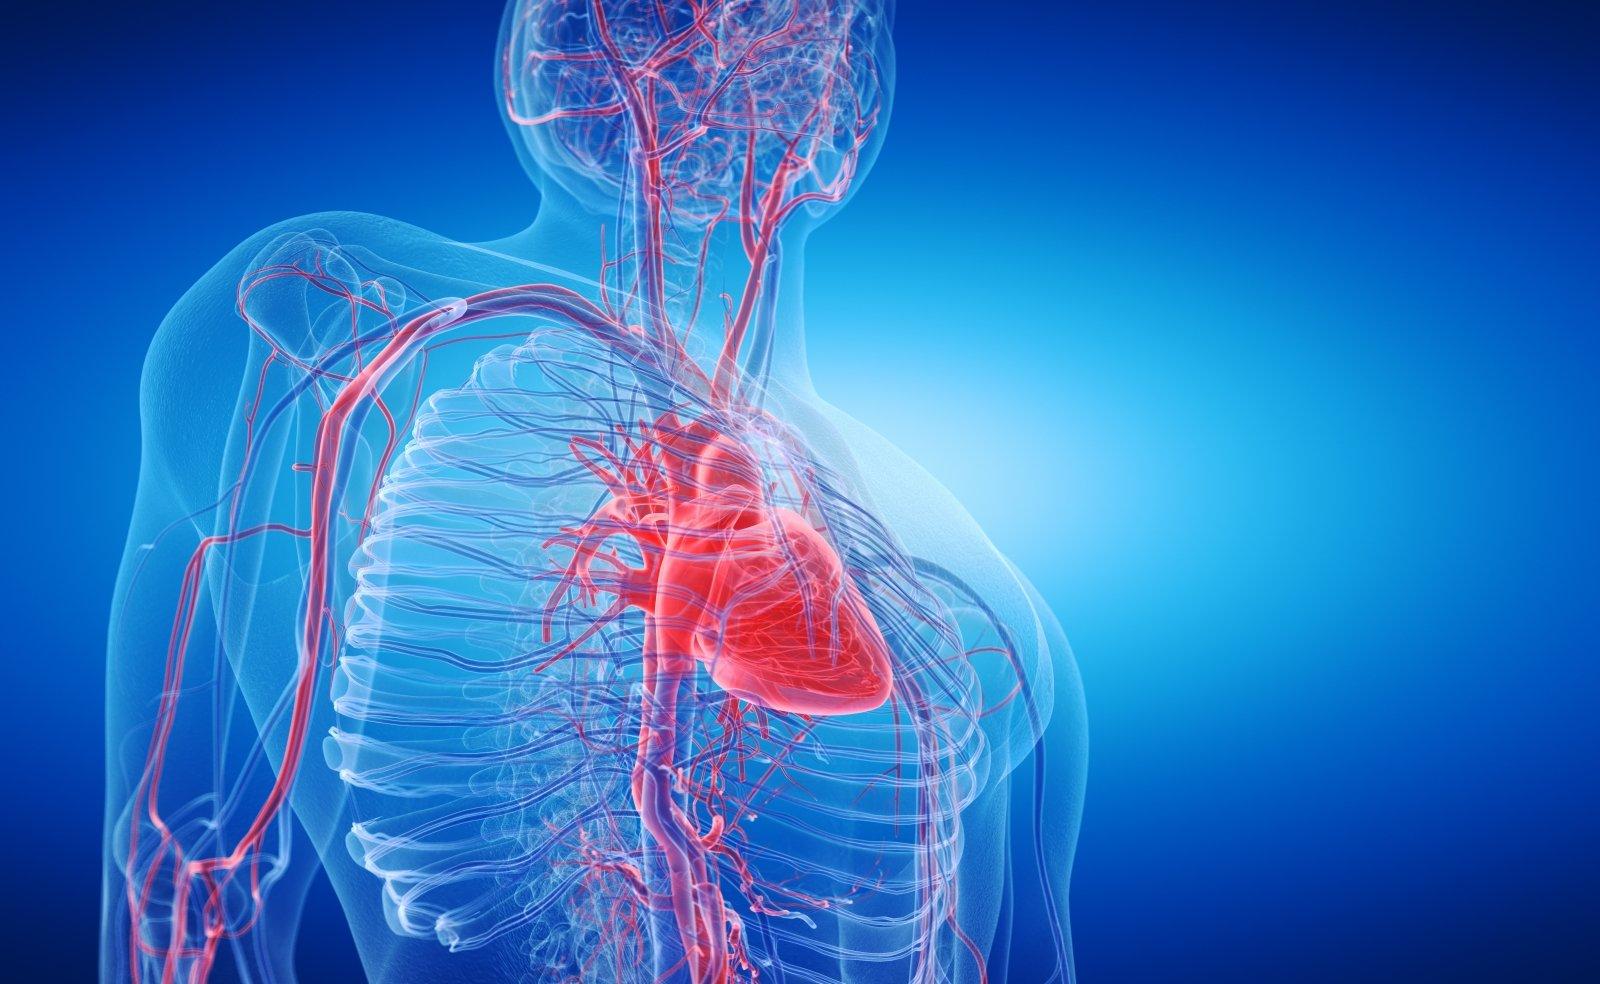 kaip gydyti nervinę hipertenziją su hipertenzija, diuretikais